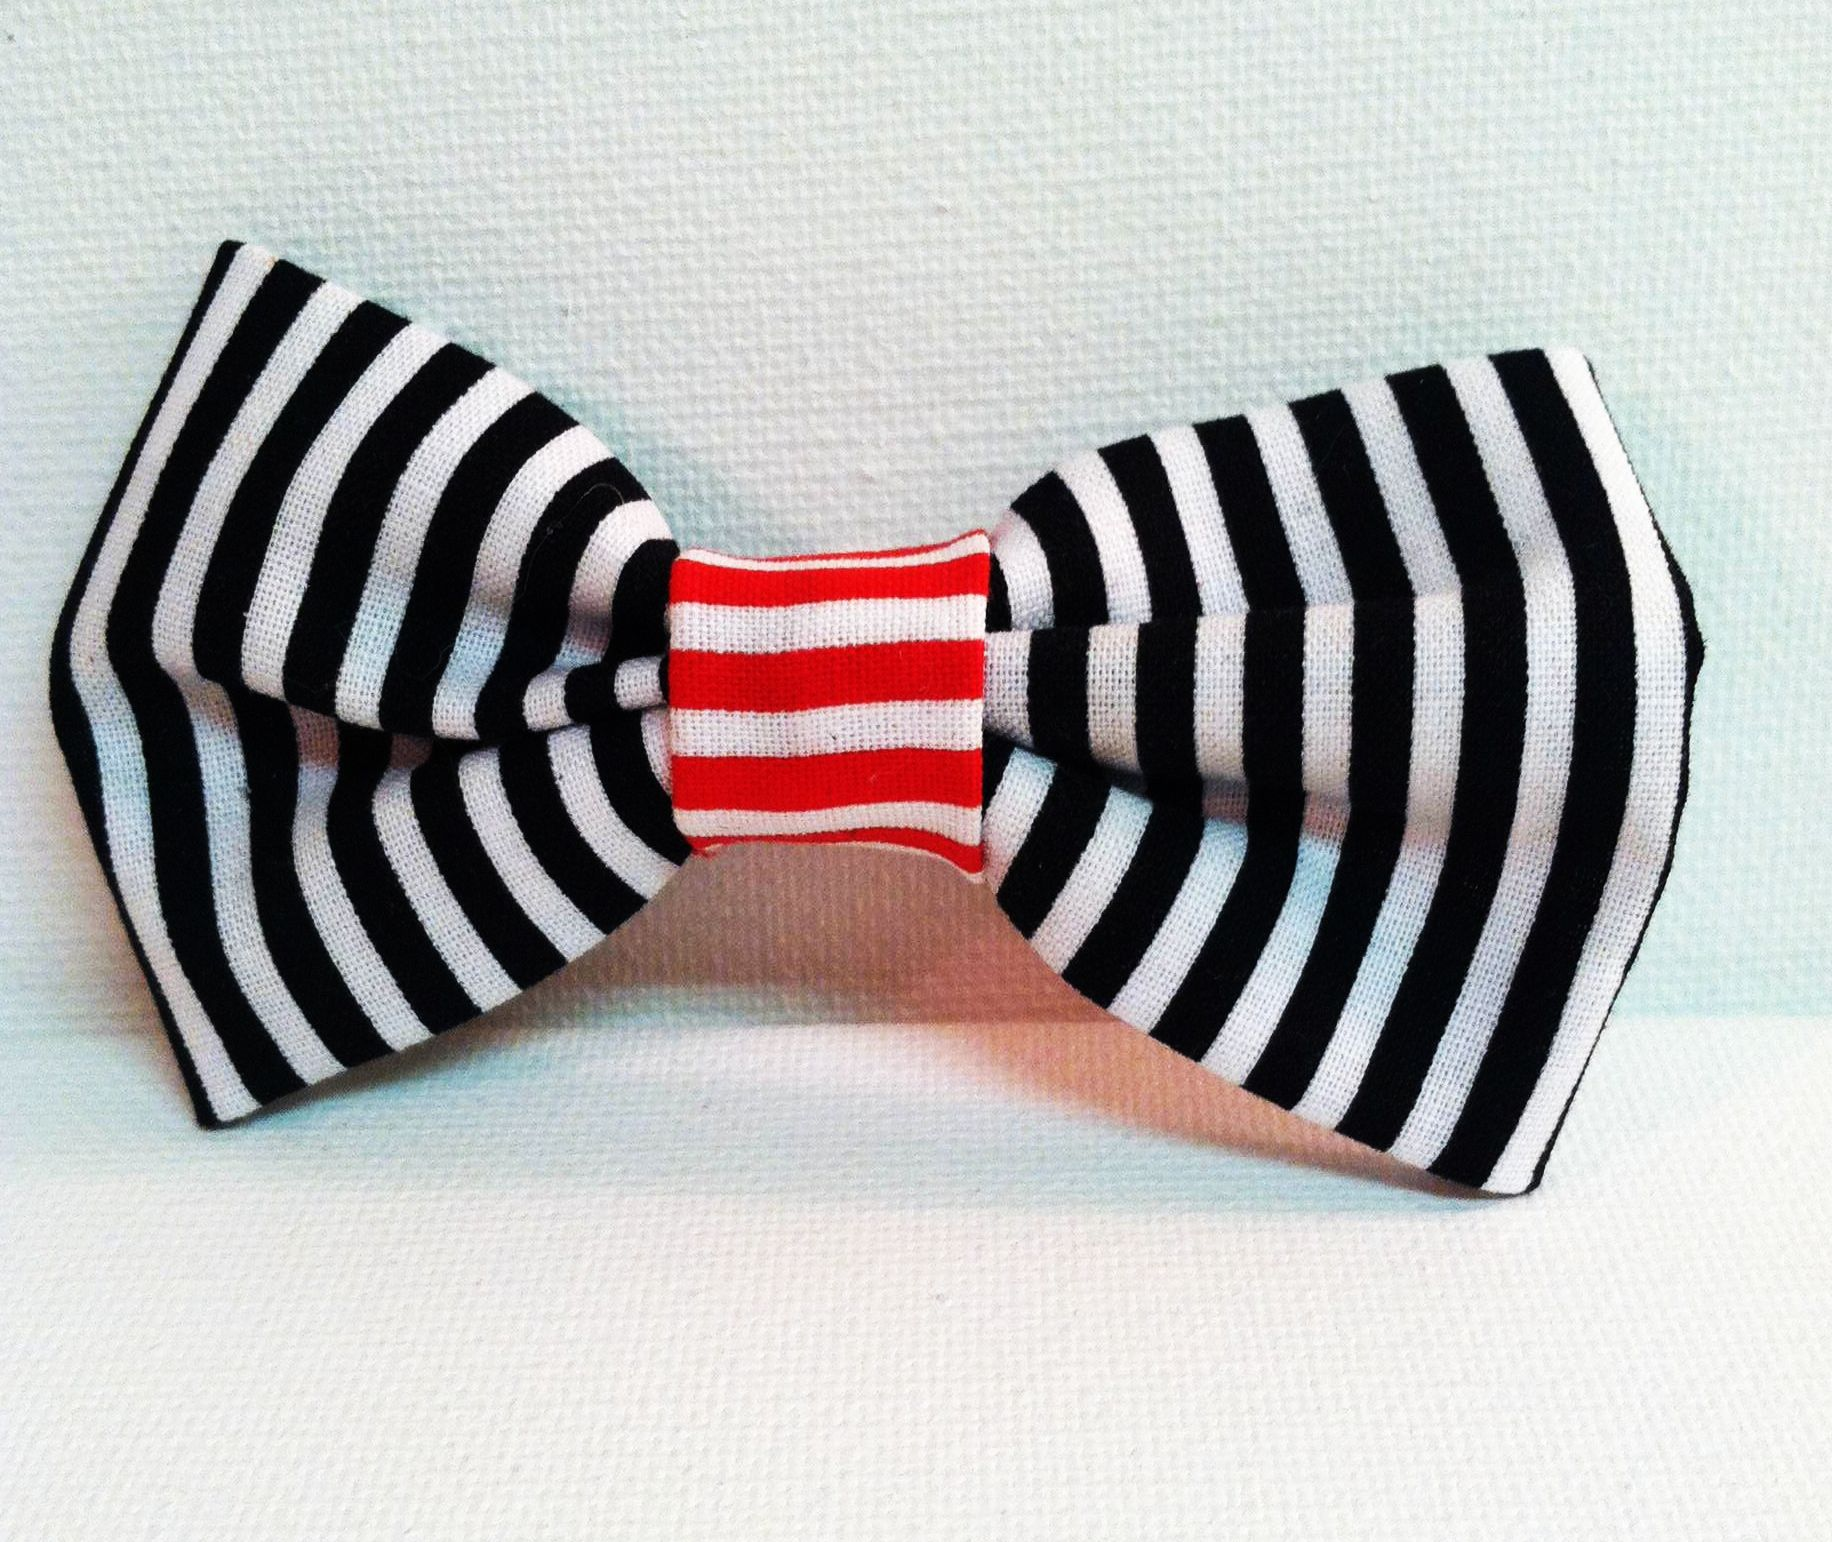 http://kuteasabuttonshop.storenvy.com/products/3783349-stripey-hair-bow